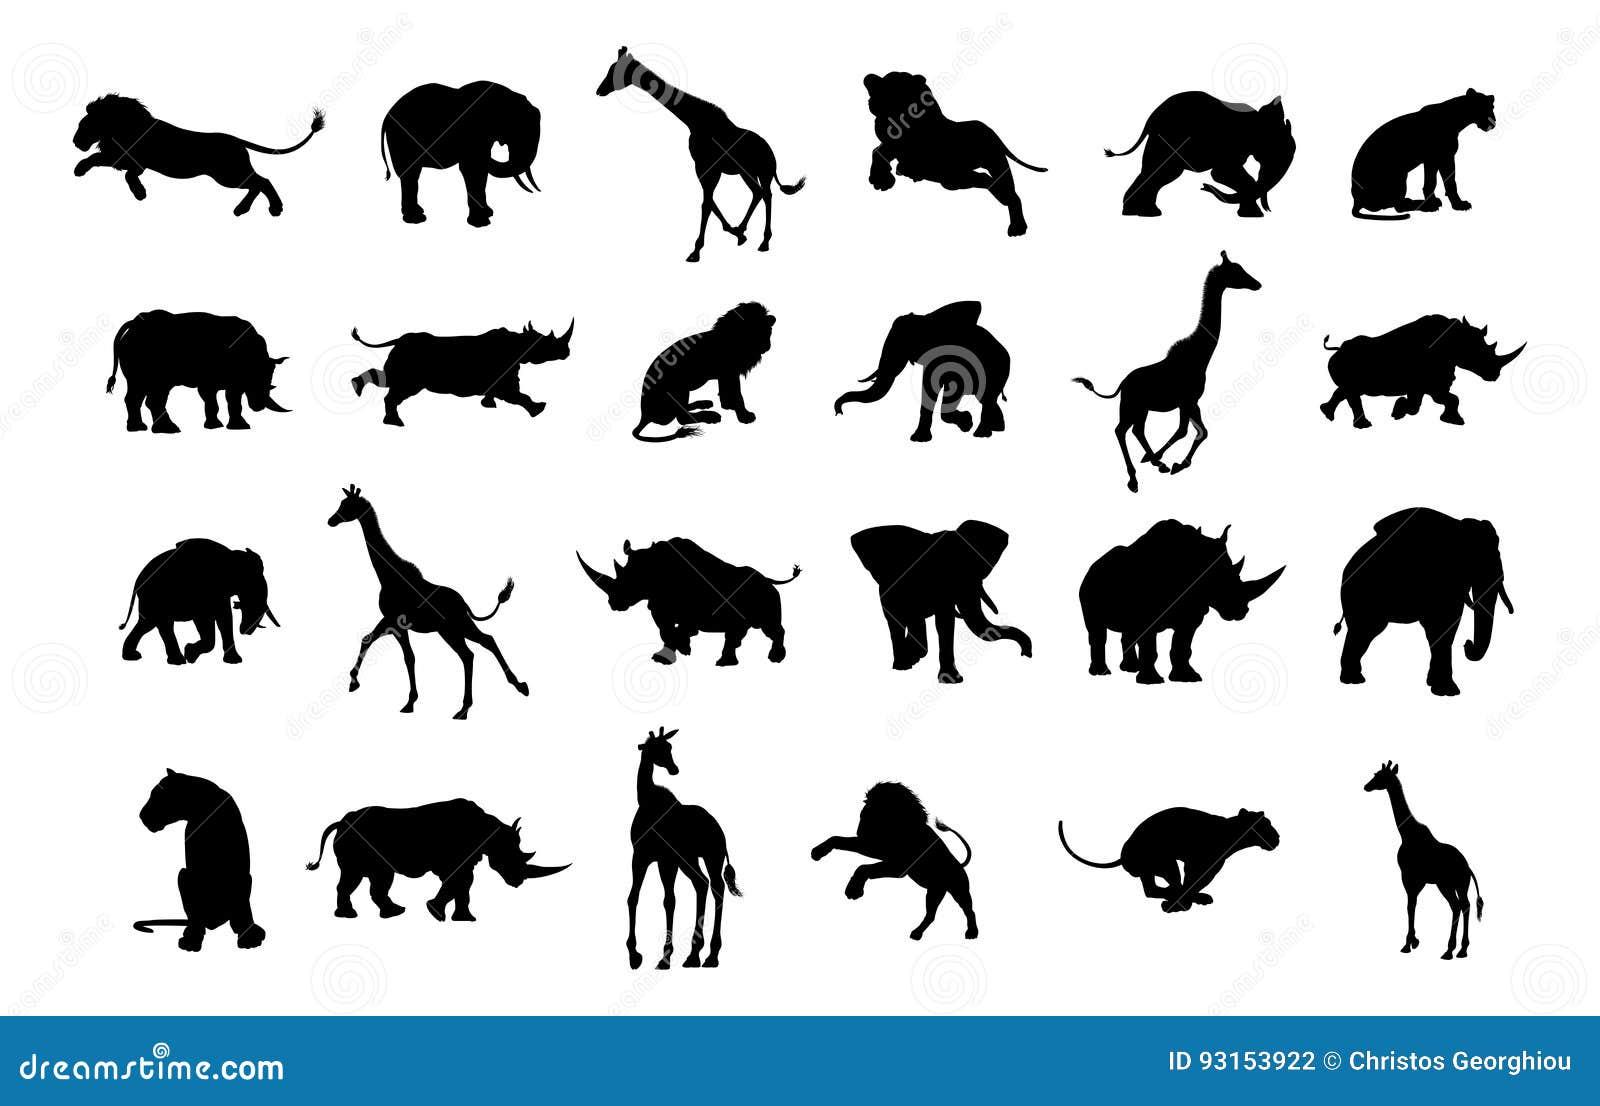 Africano Safari Animal Silhouettes